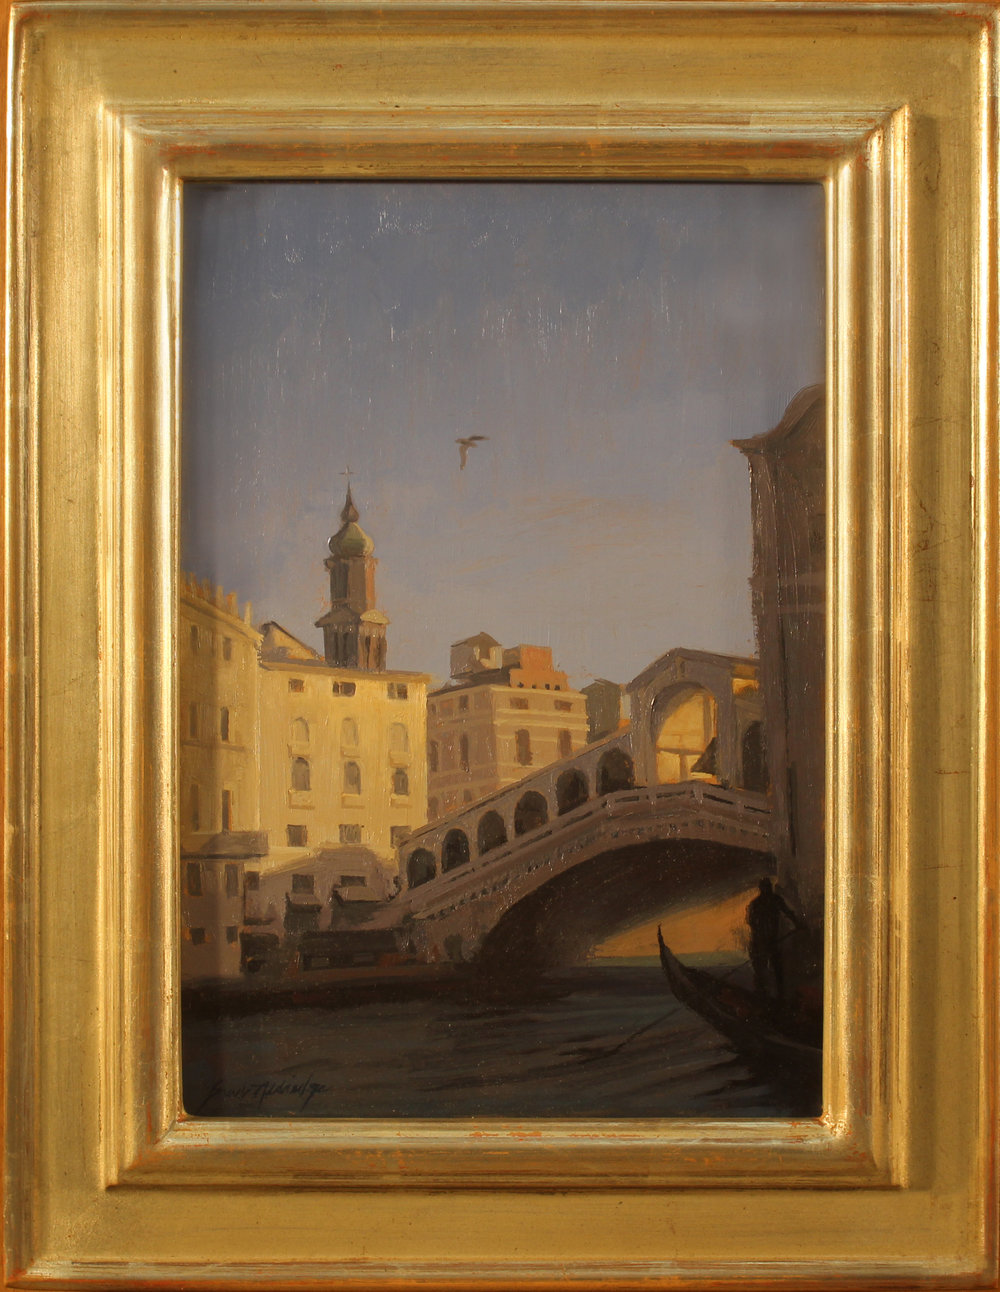 Dusk, Ponte di Rialto, Venice,#1167, 11 x 7.5 panel, 15 x 11.5 frame, $1,800.jpg